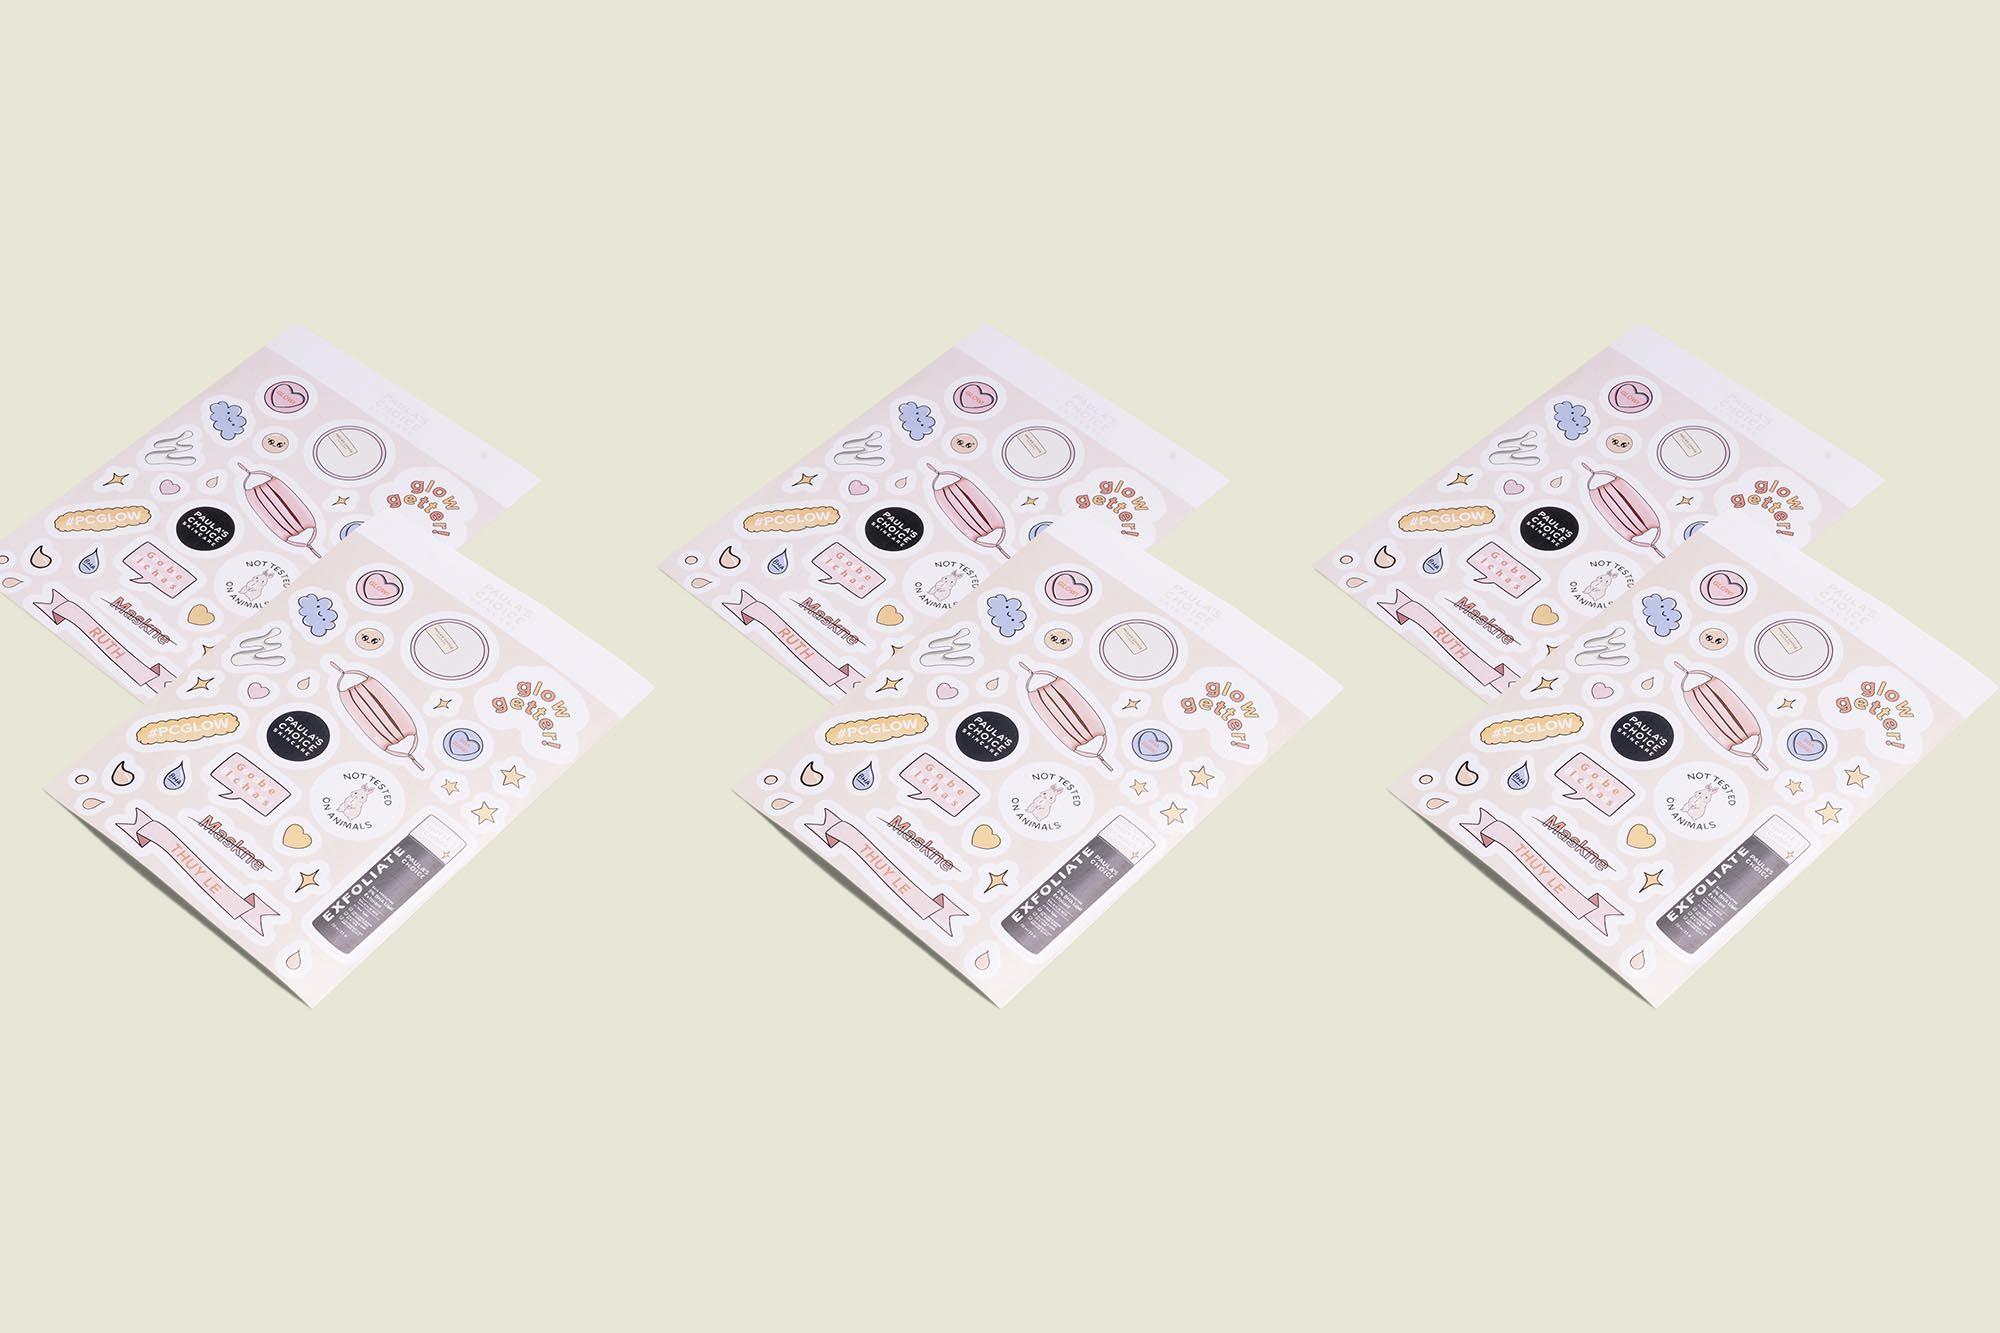 Set of sticker packets